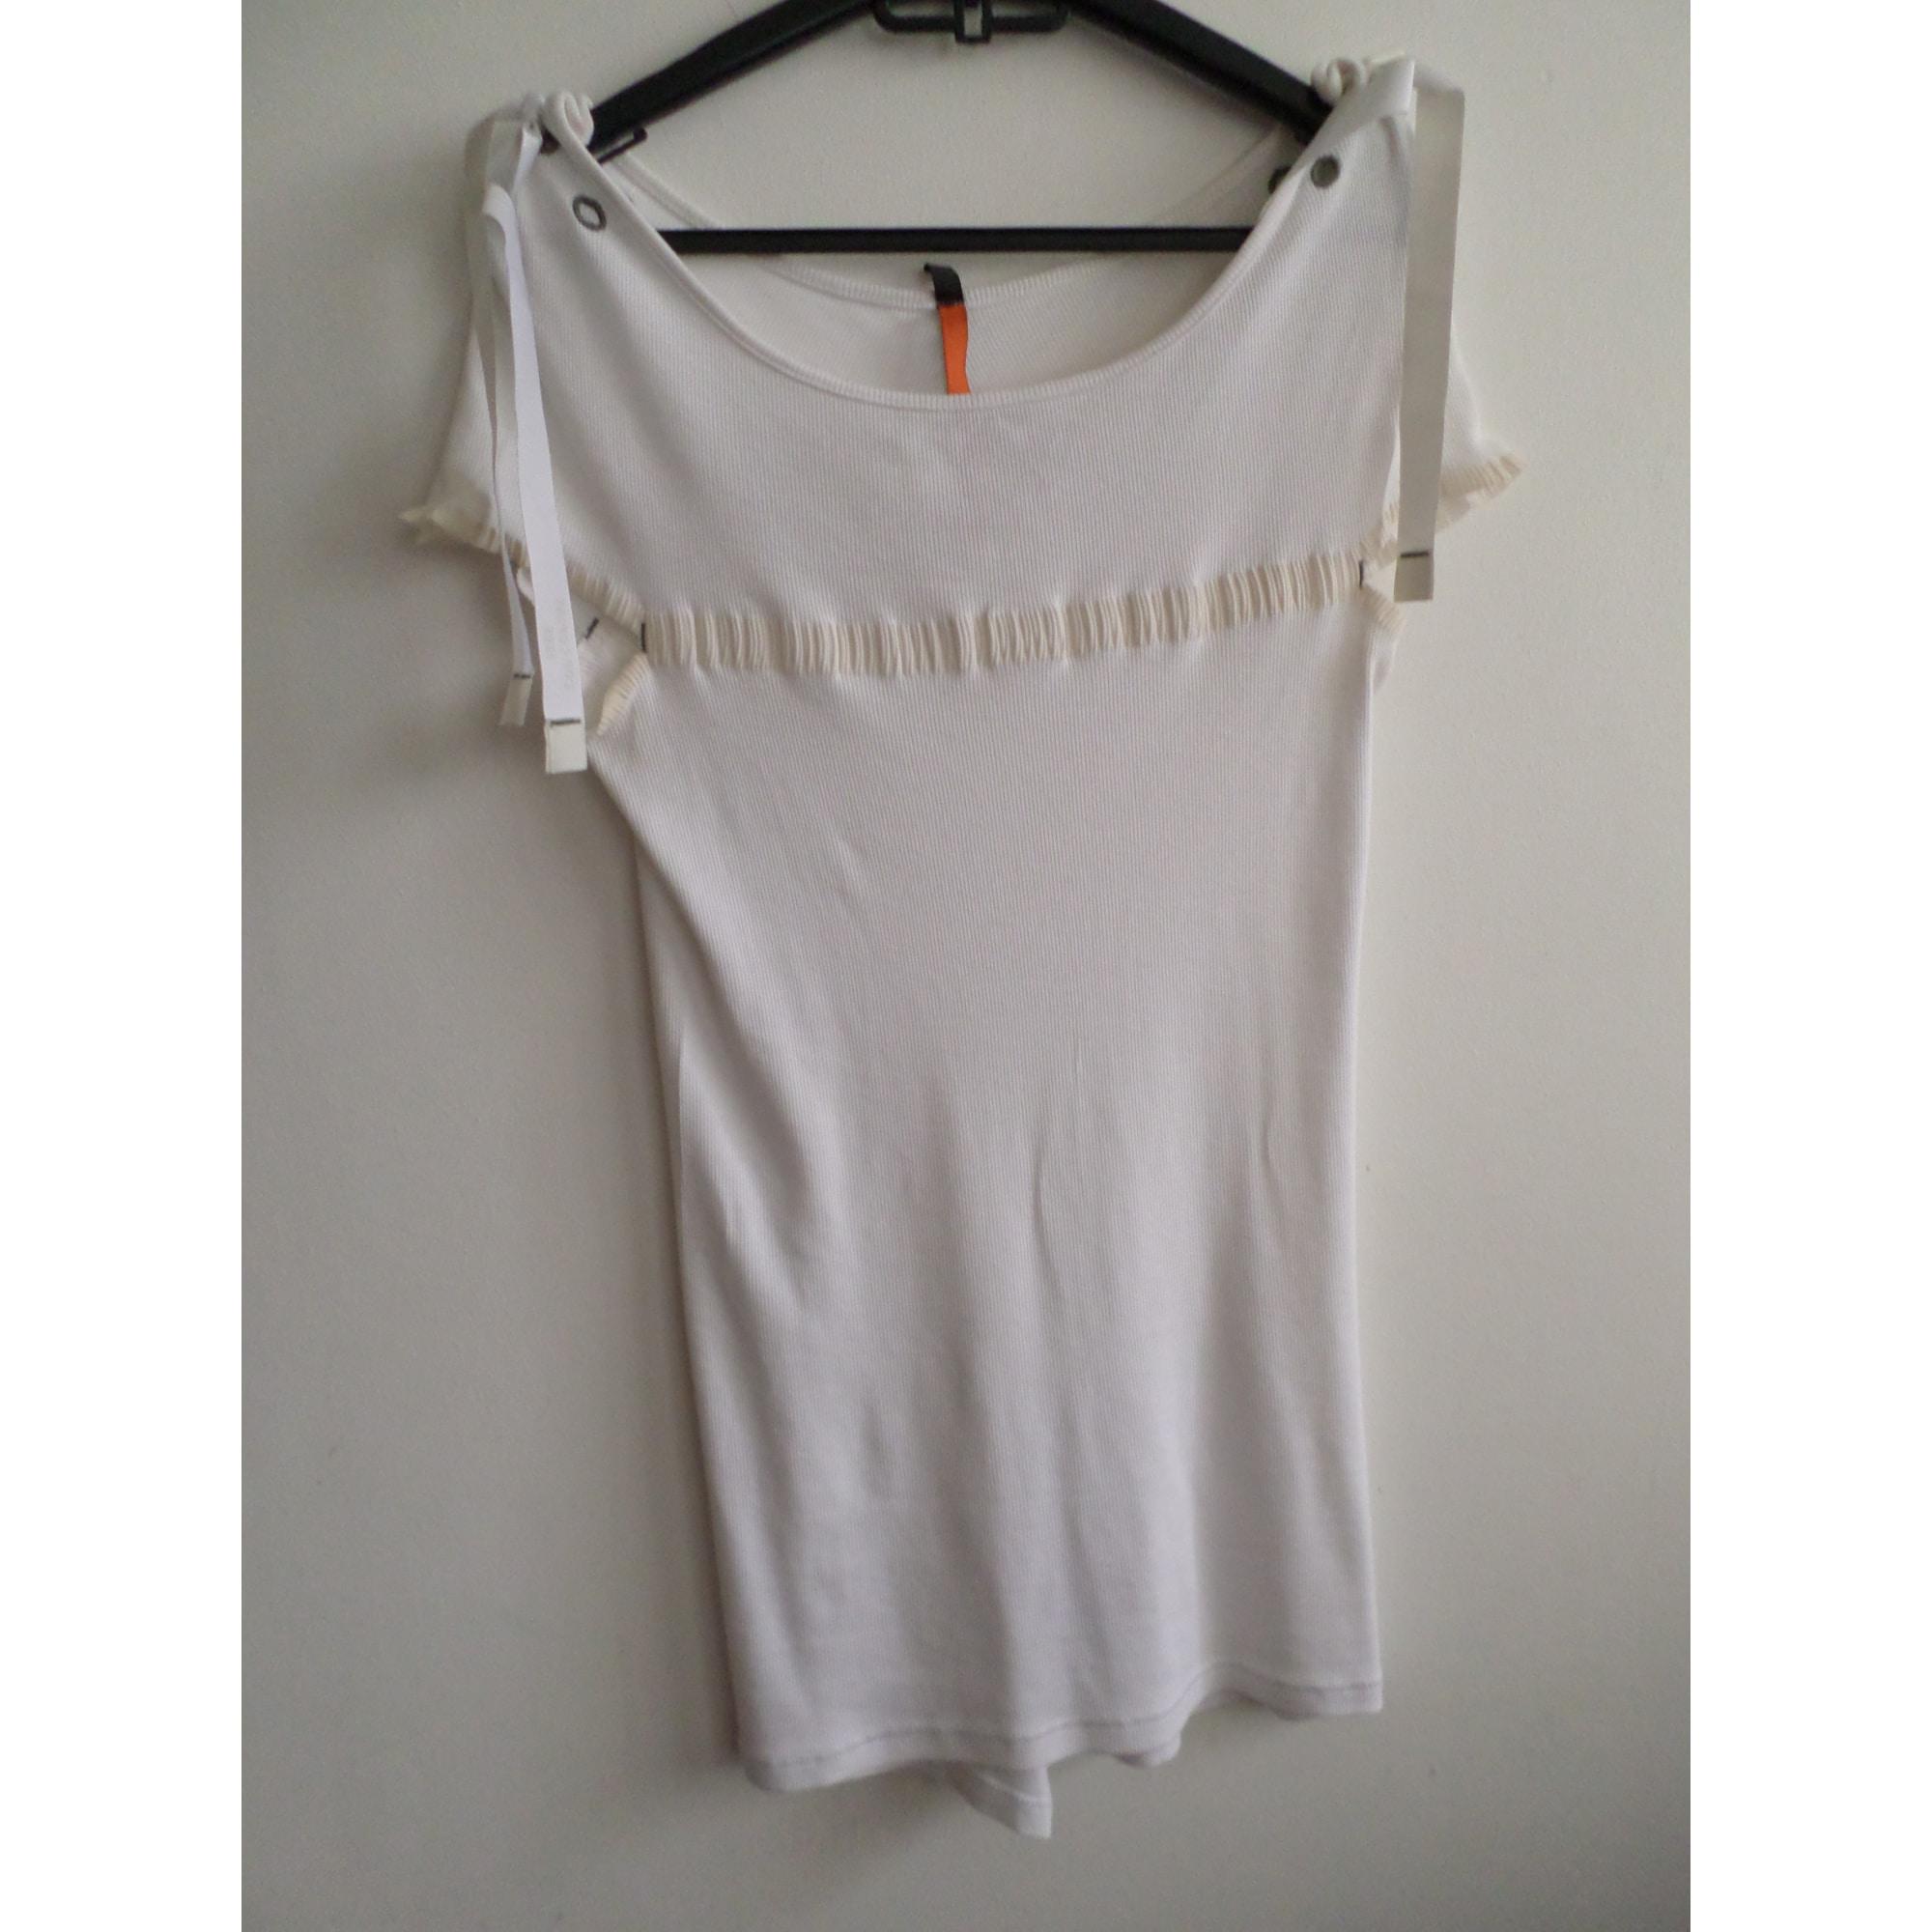 Top, tee-shirt COP-COPINE Blanc, blanc cassé, écru